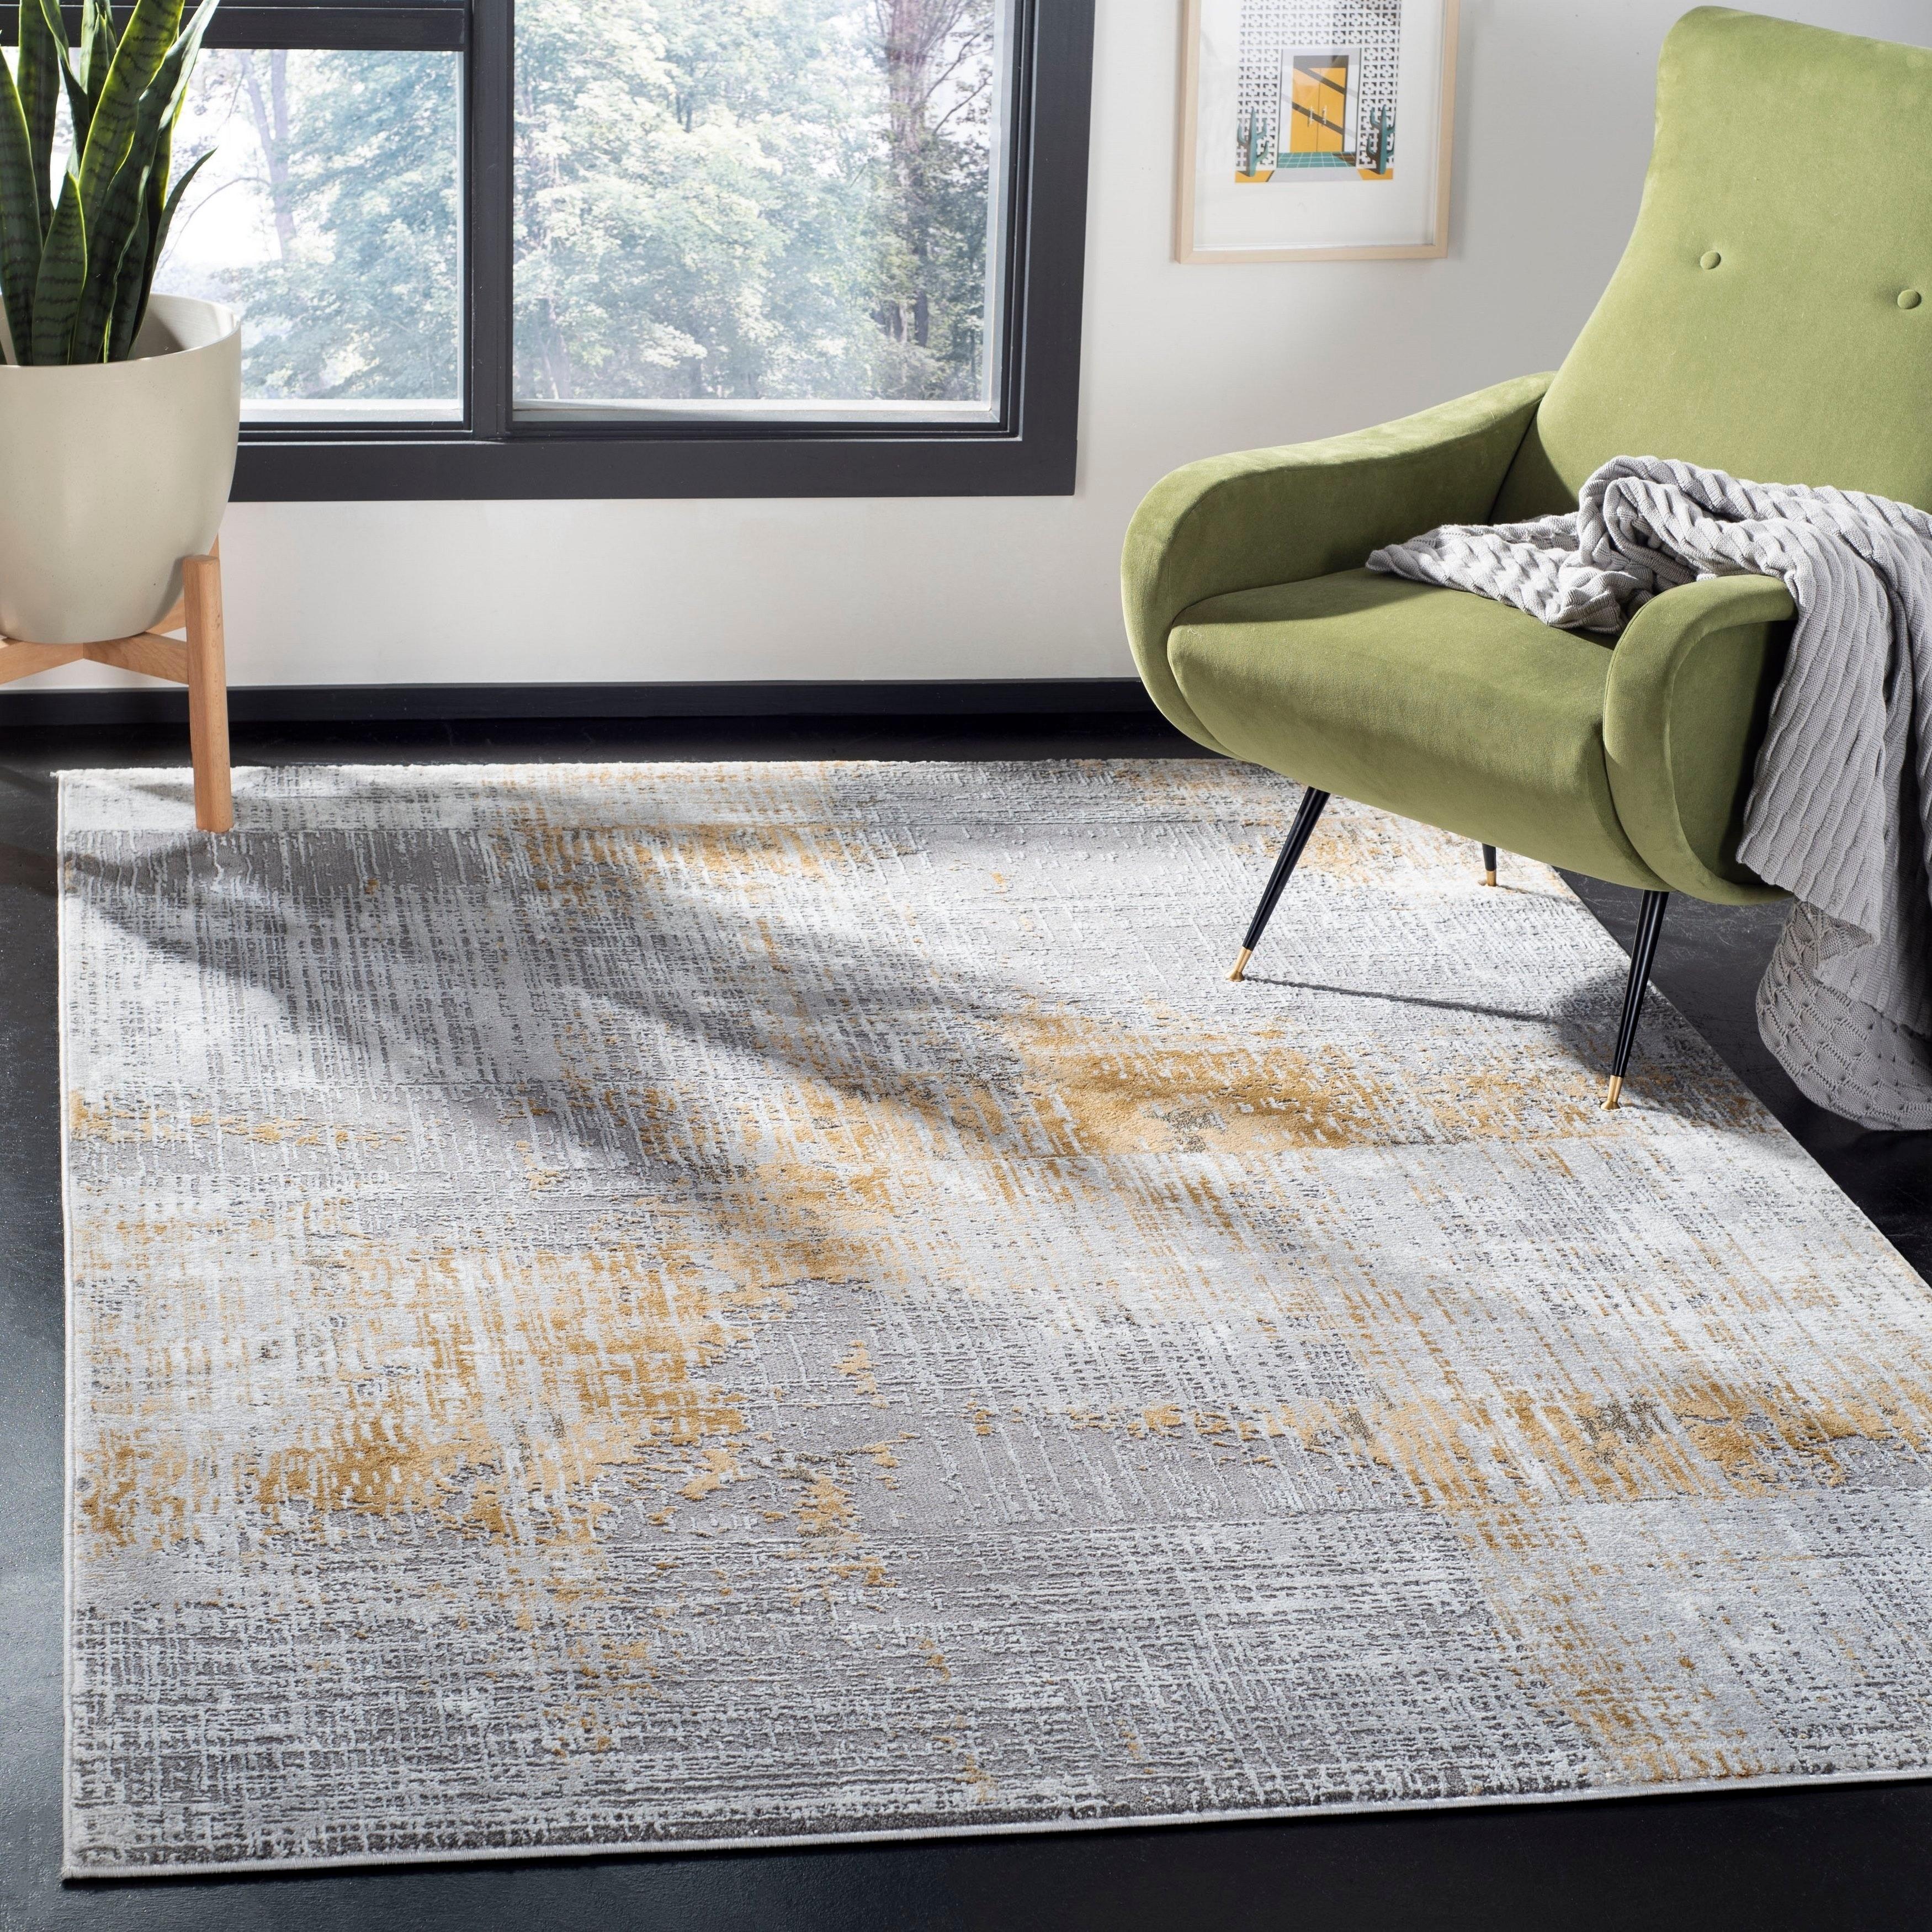 Shop Safavieh Craft Hertha Modern Abstract Rug On Sale Free